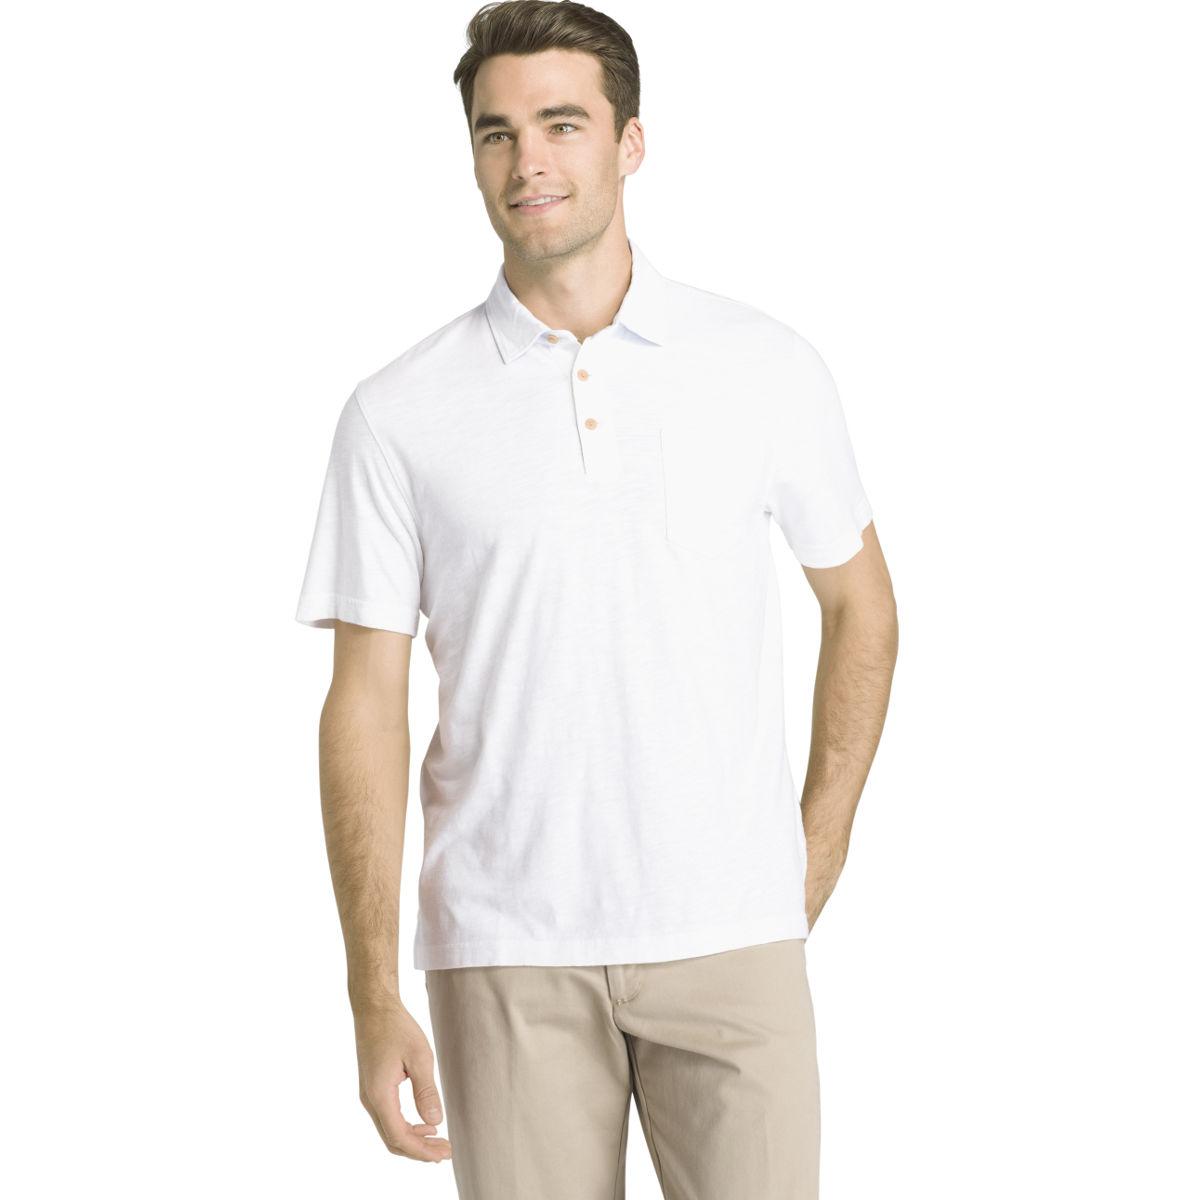 Izod Men's Wellfleet Slub Short-Sleeve Polo Shirt - White, L